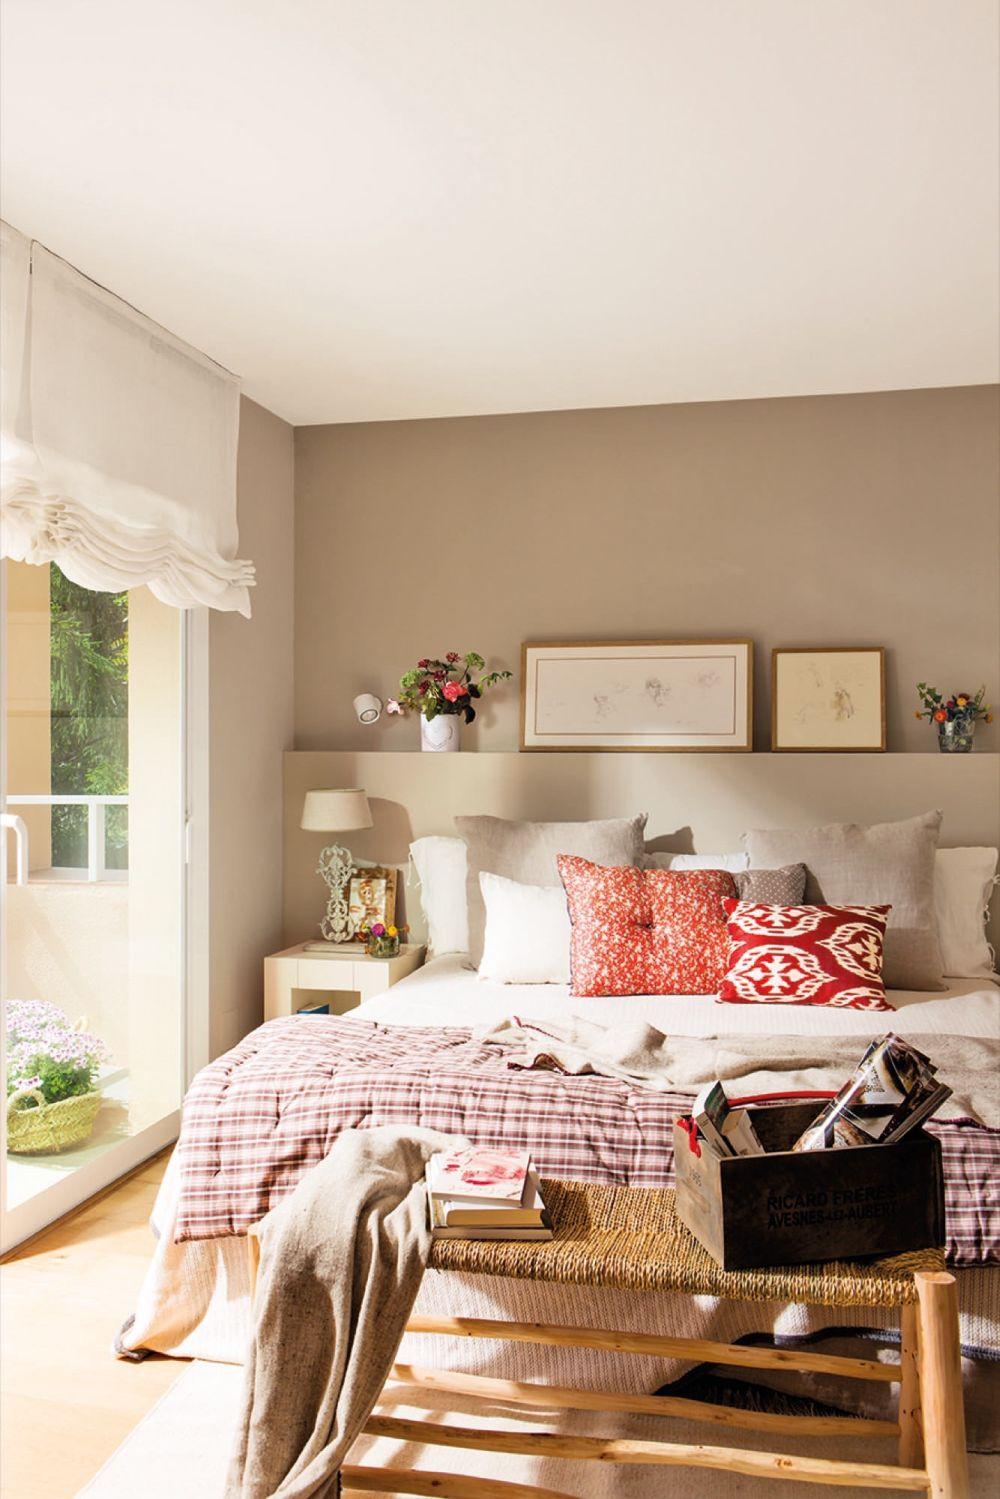 adelaparvu.com despre casa cu gradina, accente marine, designer Jeanette Dresing, Foto Feran Freixa (20)